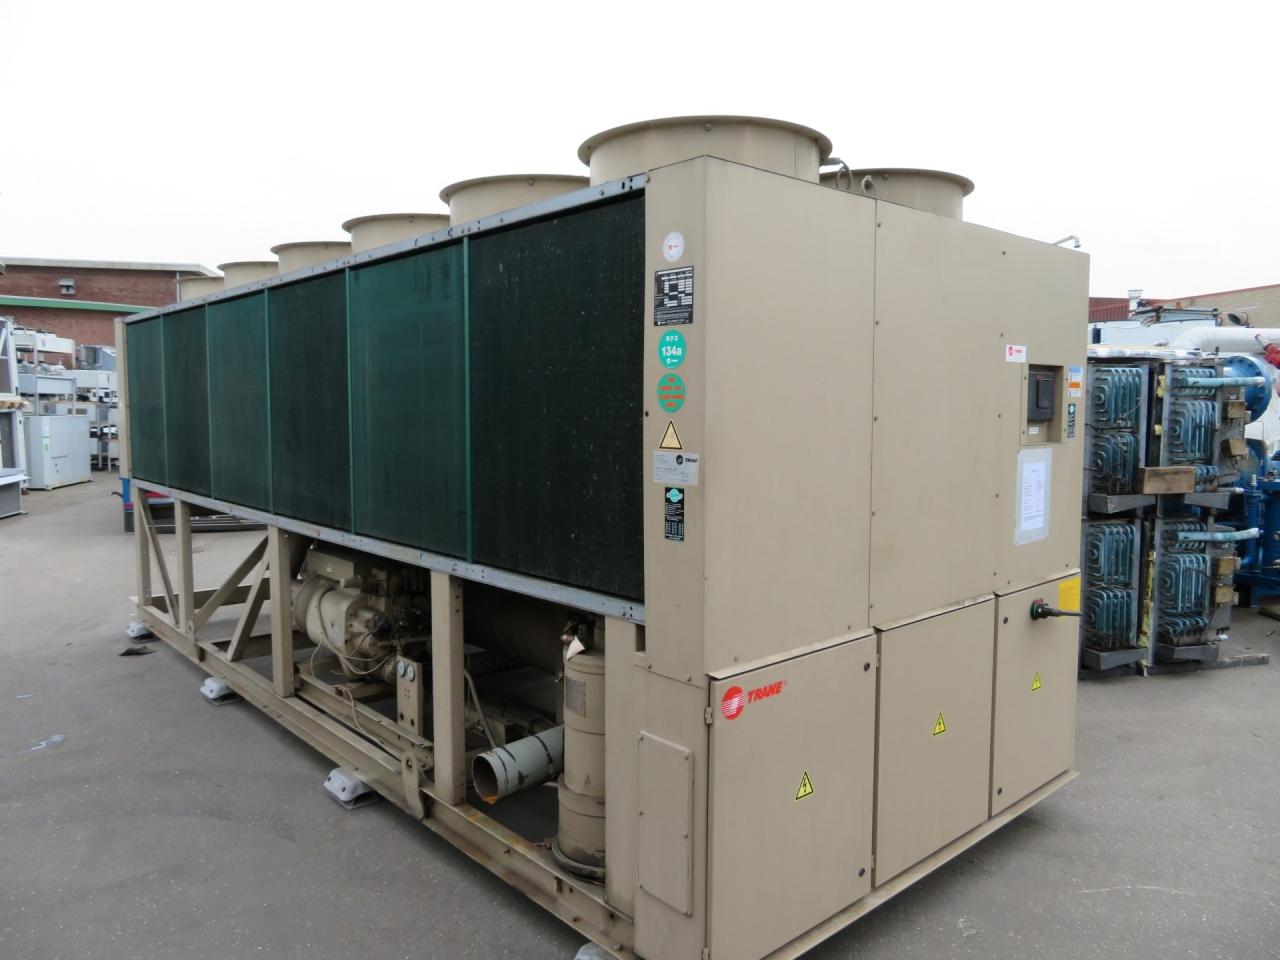 Air Cooled Waterchiller Trane Rtac 200 Hos Bv